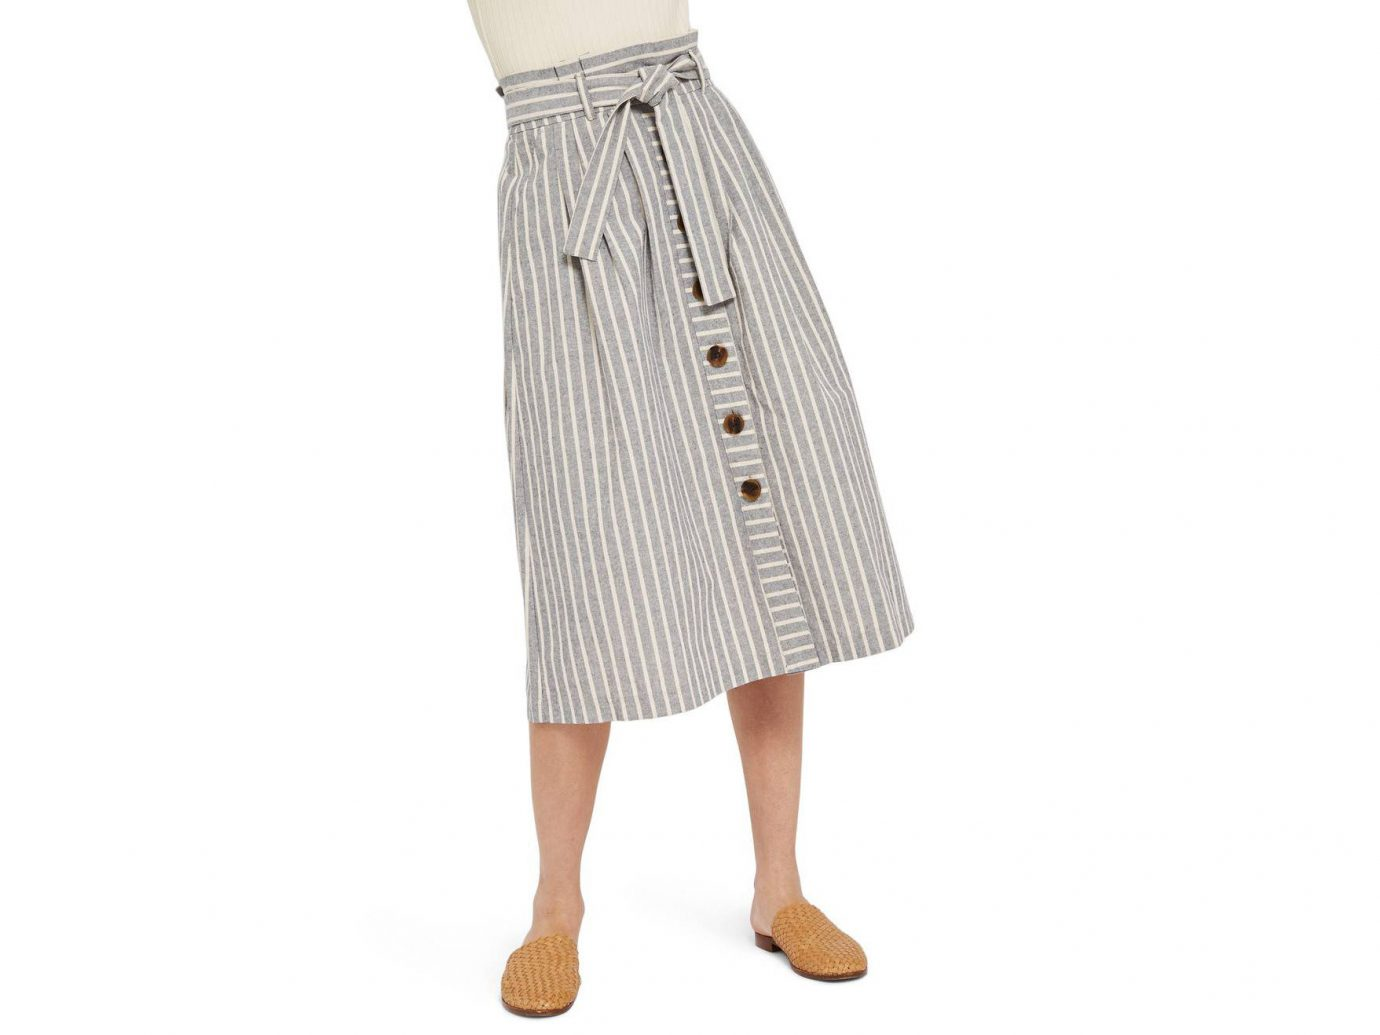 Spring Travel Style + Design Summer Travel Travel Lifestyle Travel Shop clothing day dress product skirt beige pattern dress